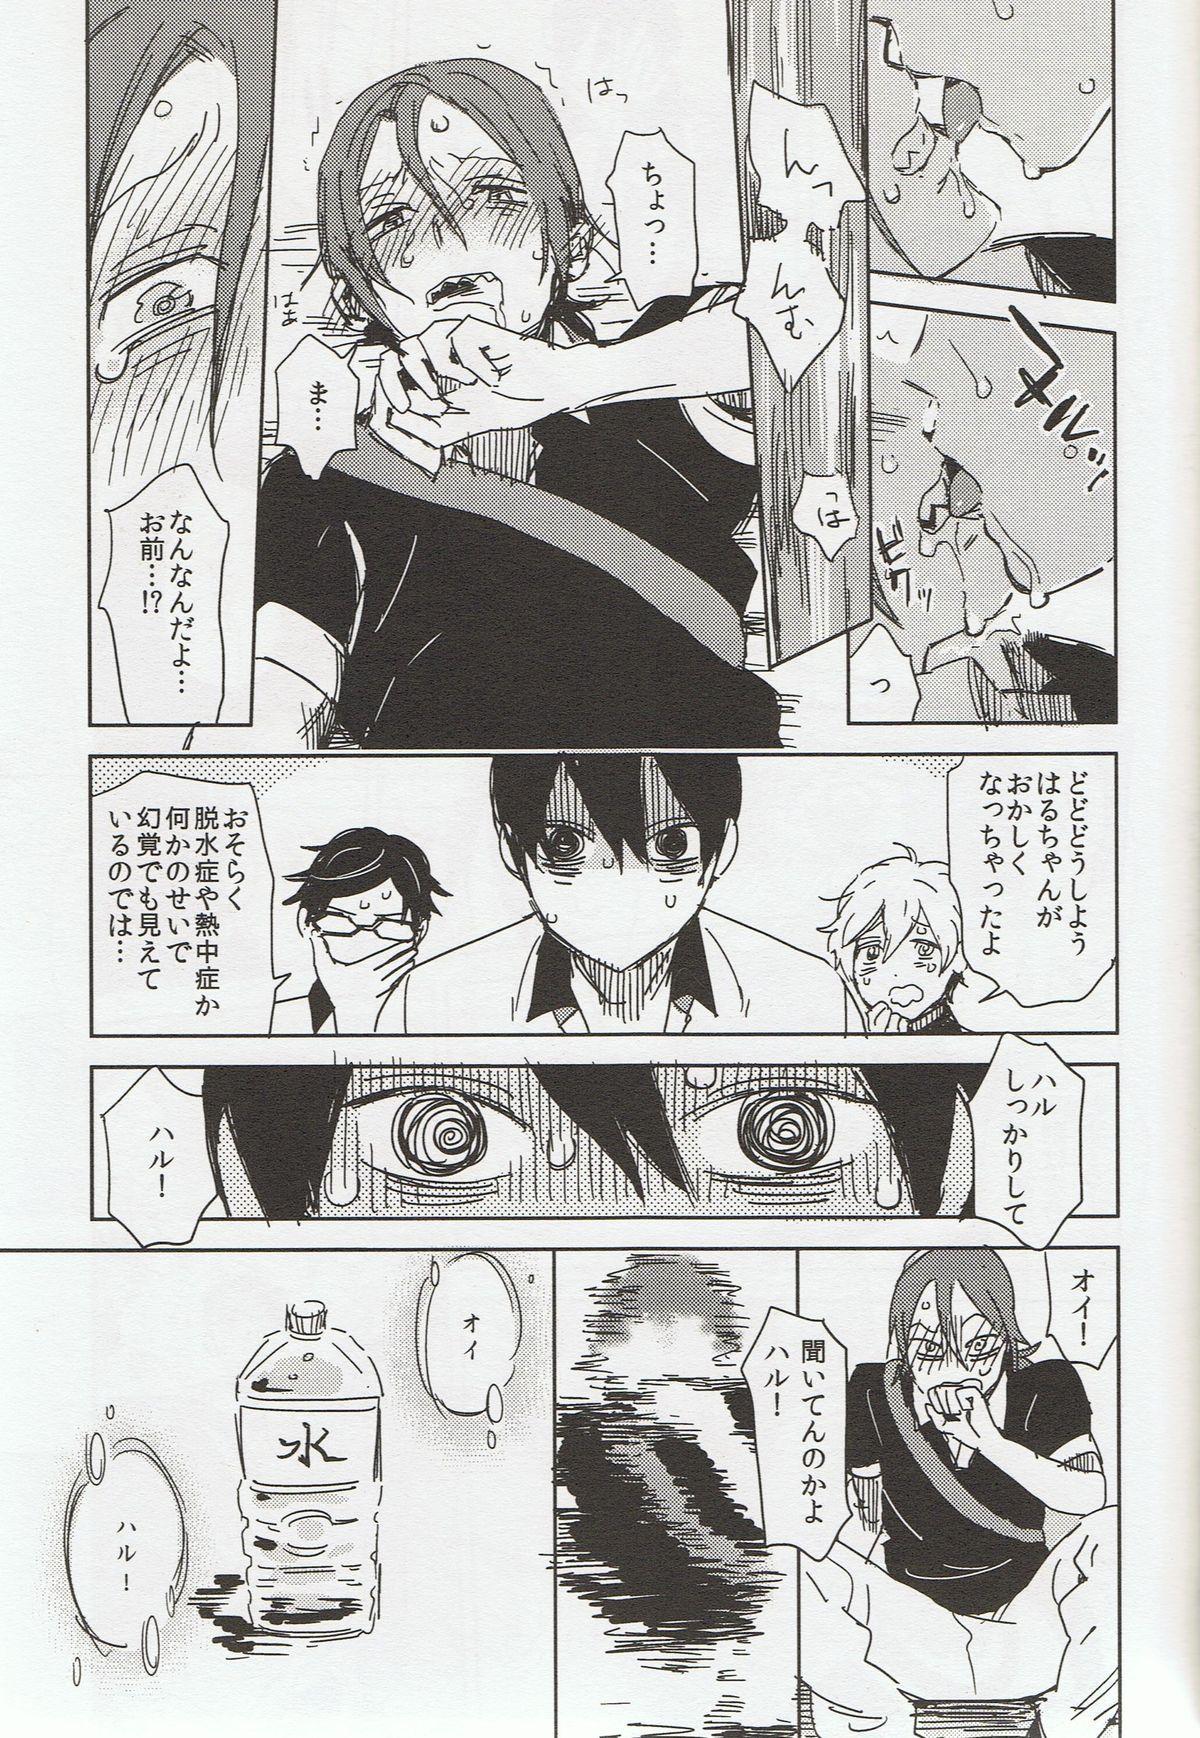 Sou da, Tottori Sakyuu Ikou. 13